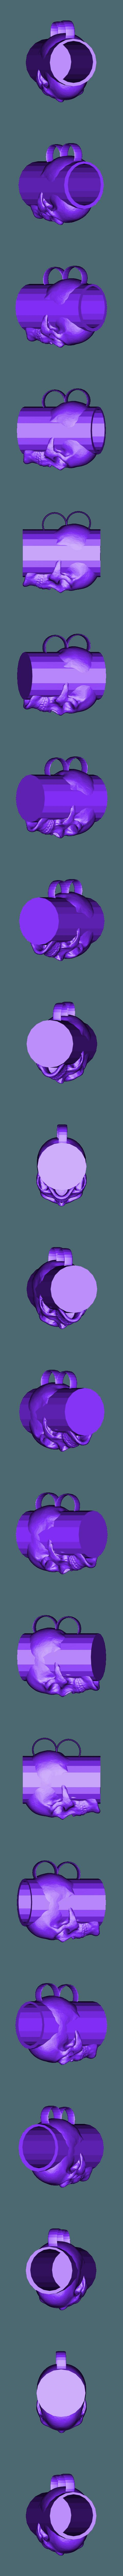 drink a skull.stl Download free STL file skull mug • 3D printer object, thenod2001